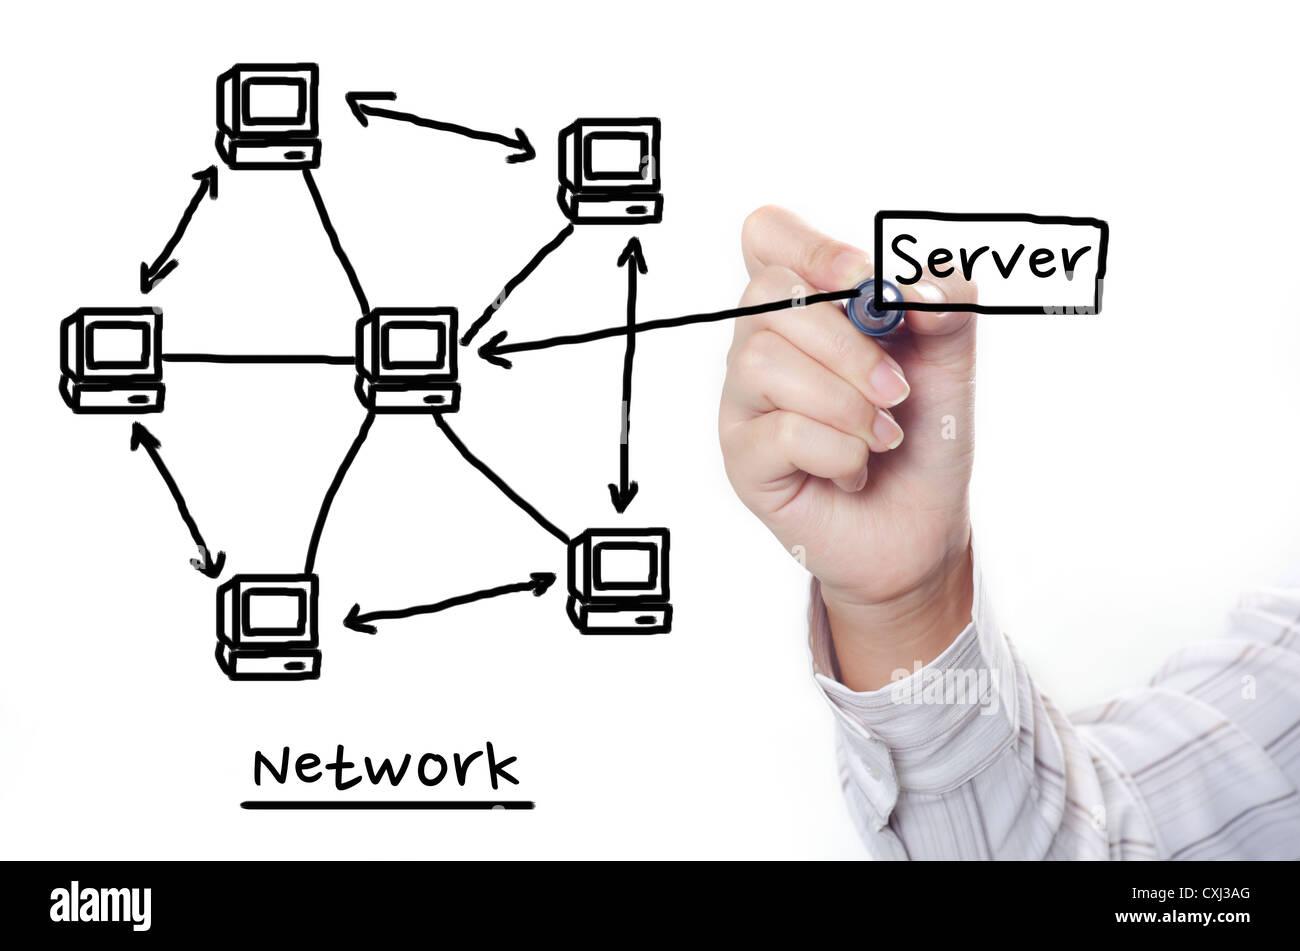 Drawing Computer Network Stockfotos & Drawing Computer Network ...